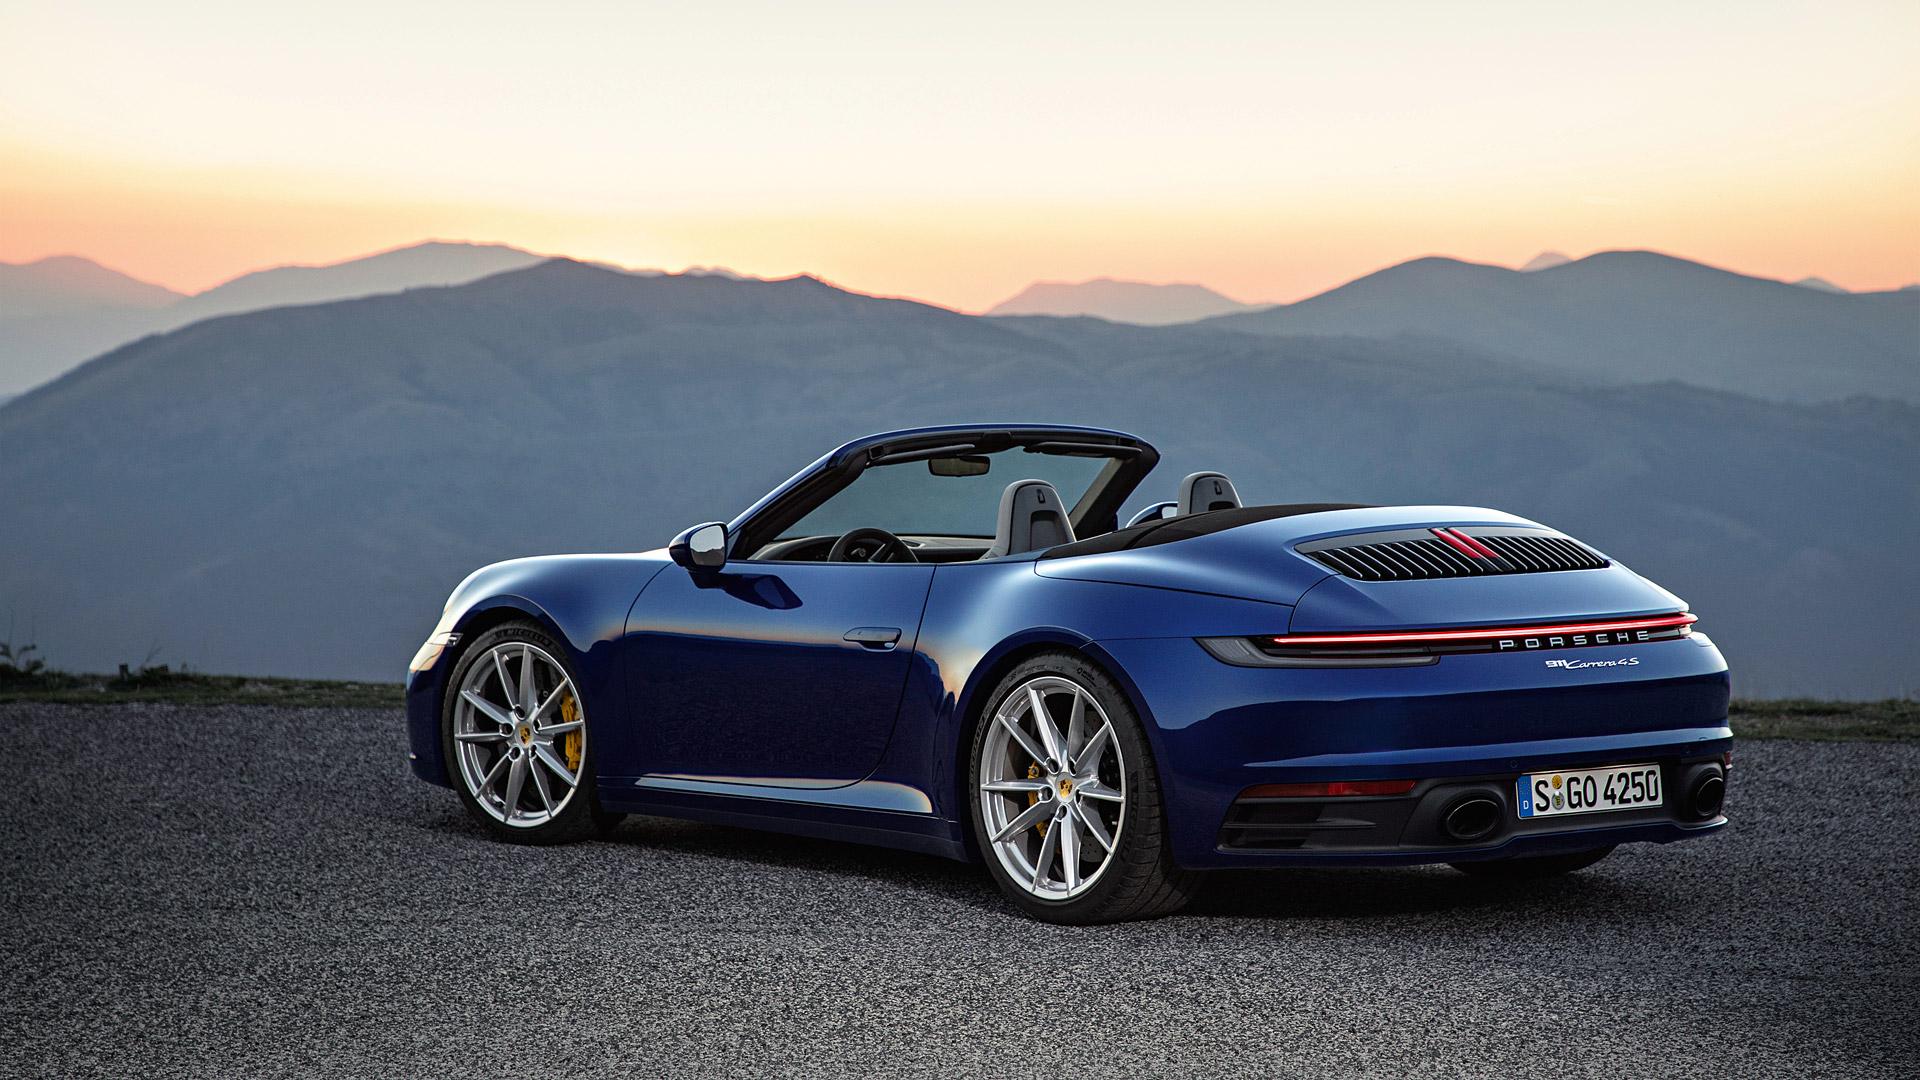 2019 Porsche 911 Carrera 4S Wallpapers HD Images   WSupercars 1920x1080